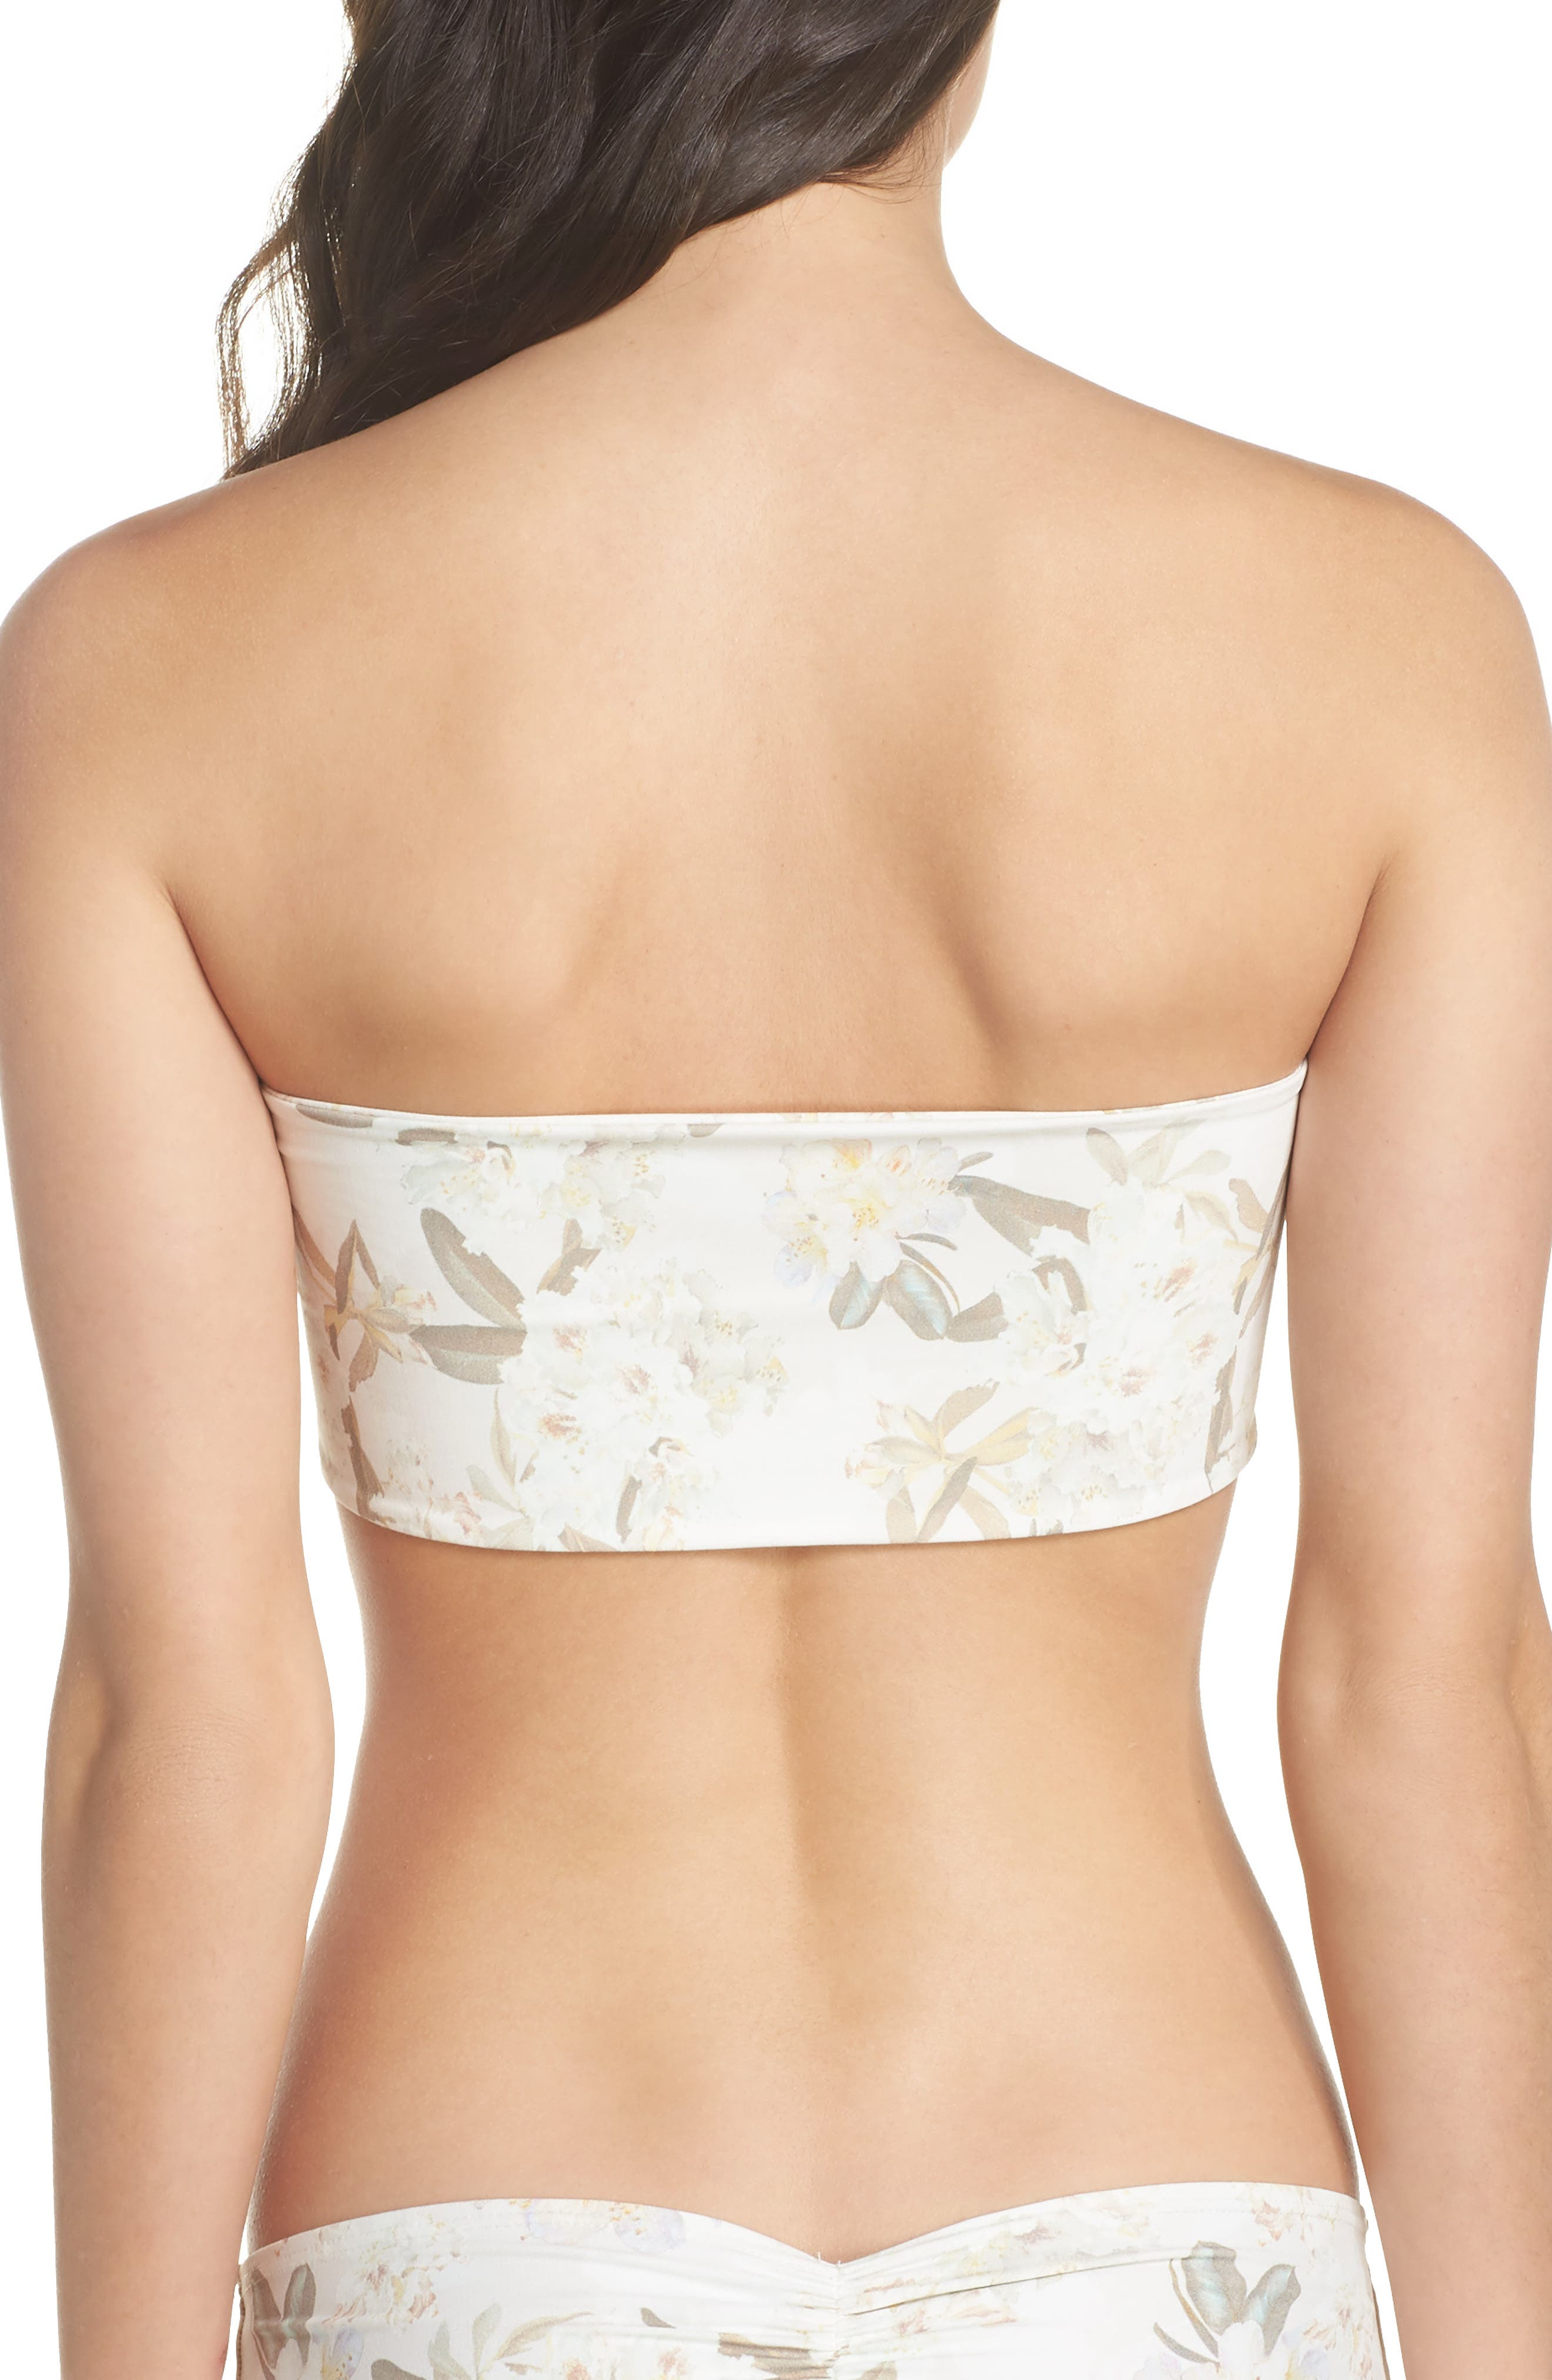 Floral Corset Bikini Top,                             Alternate thumbnail 2, color,                             Ete Floral White